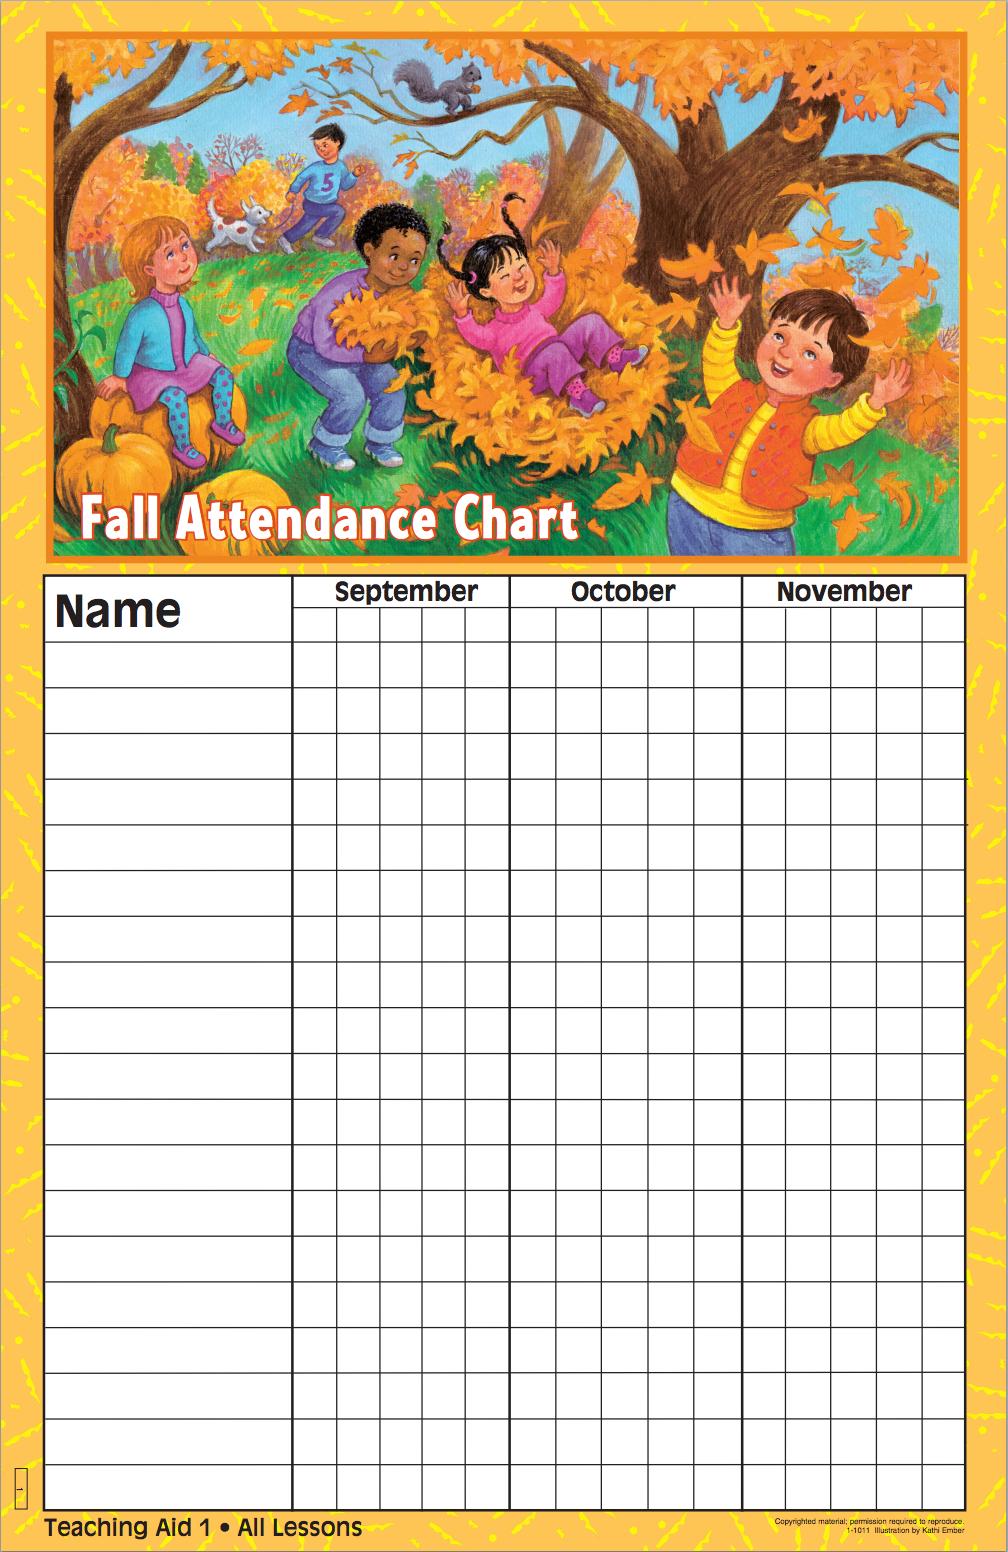 Fall Attendance Chart | BIL Preschool | Disciplr.com ...